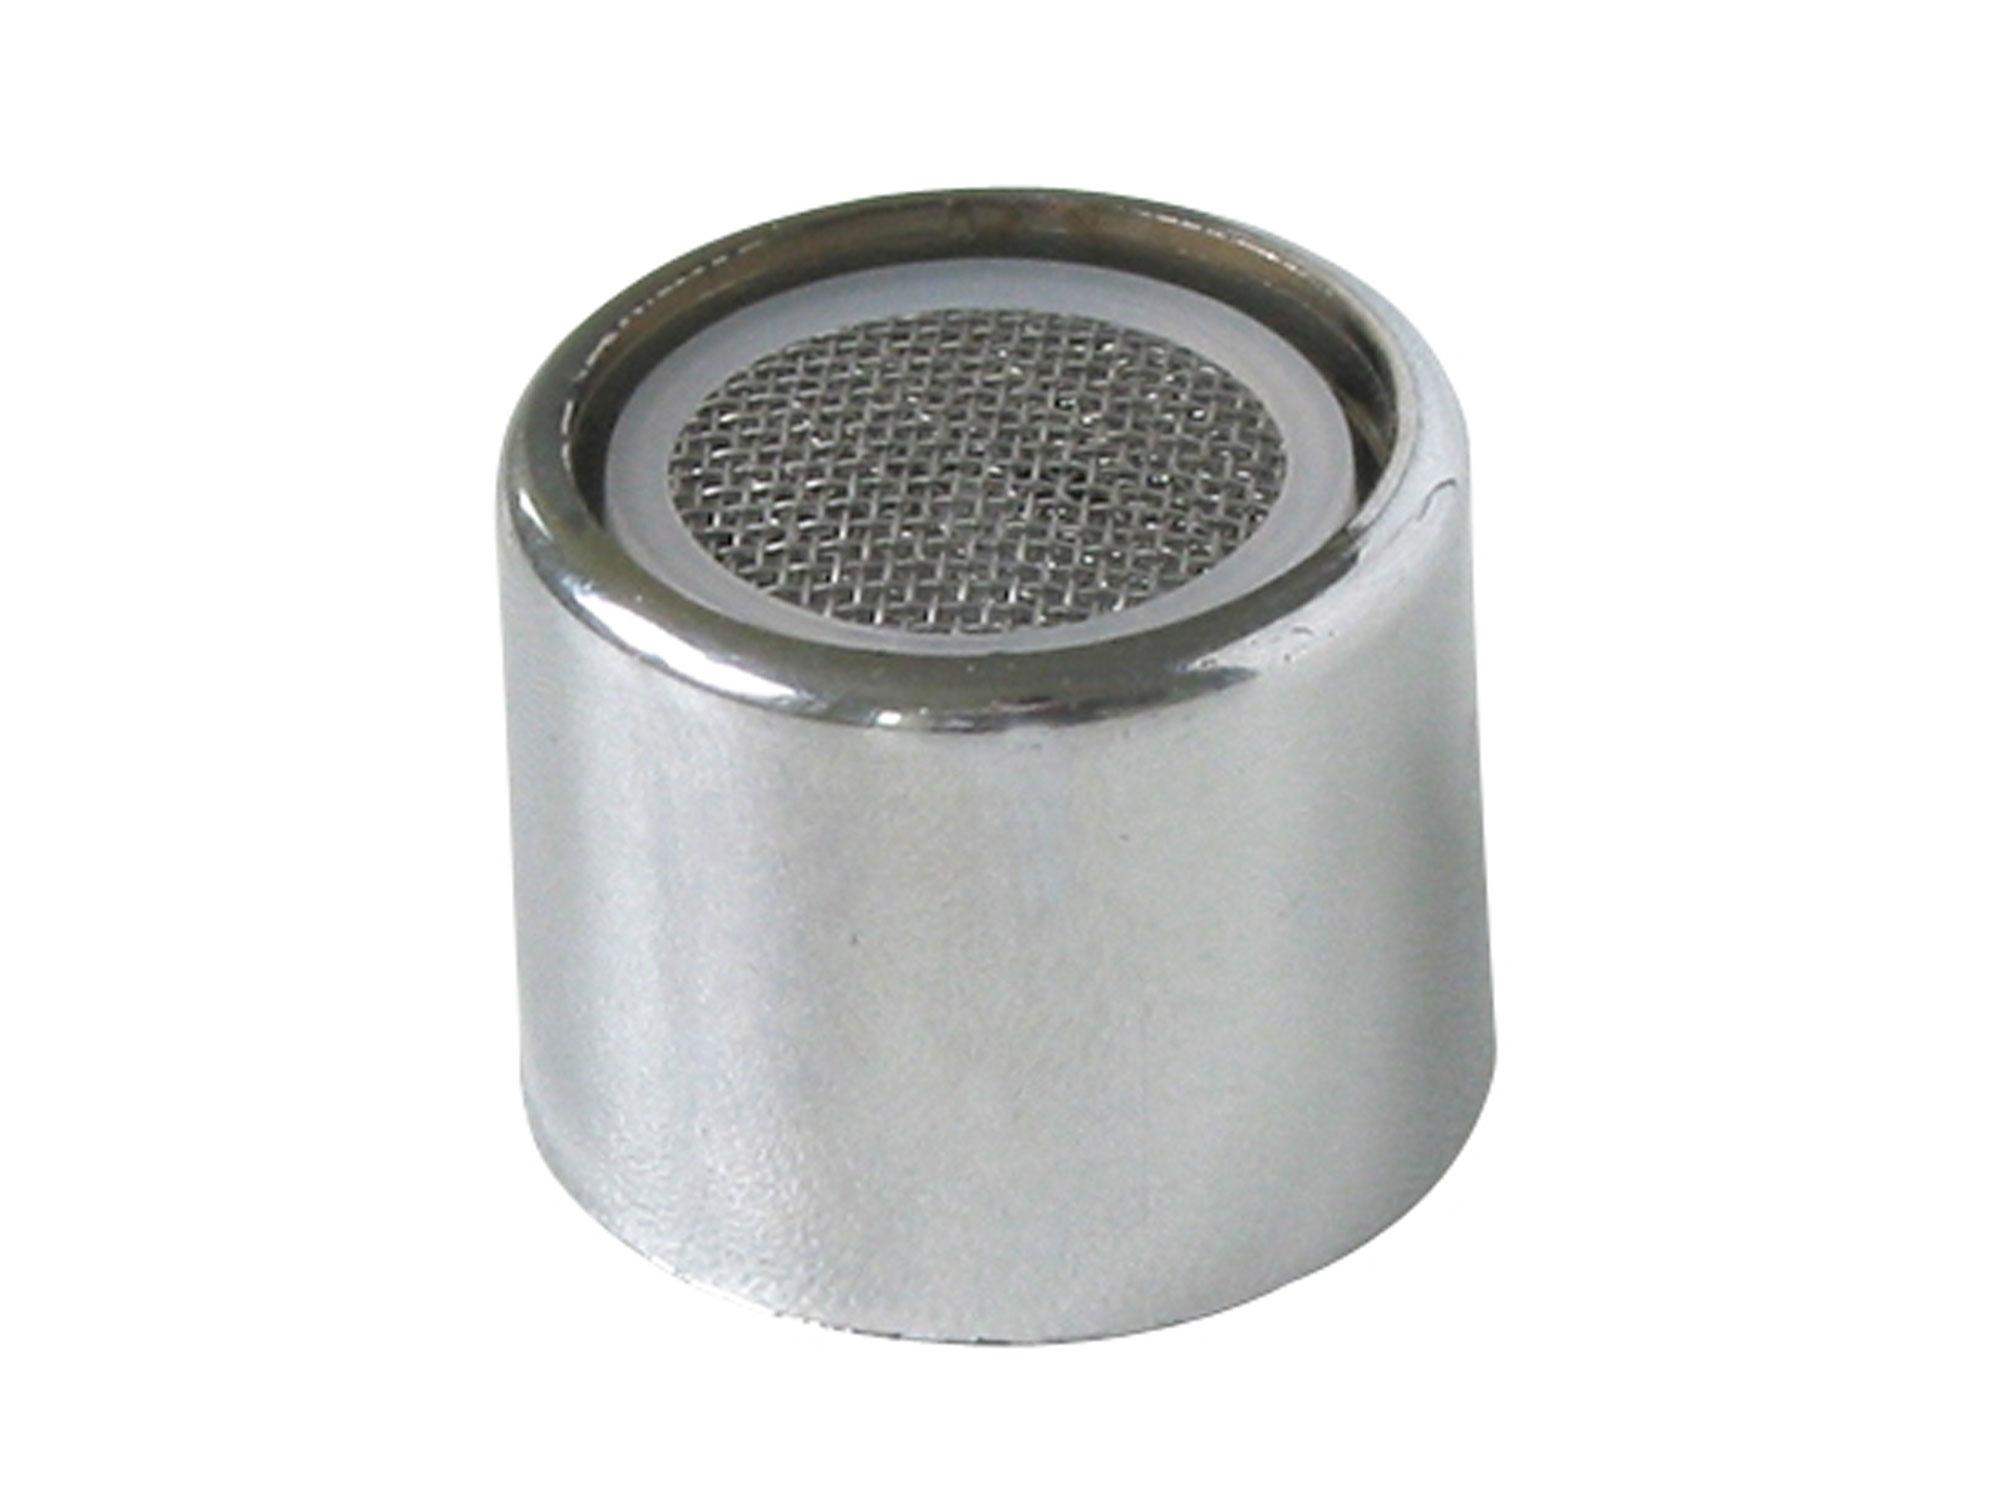 perlátor pro S-zakřivené ramínko, M24, chrom, BALLETTO 81079